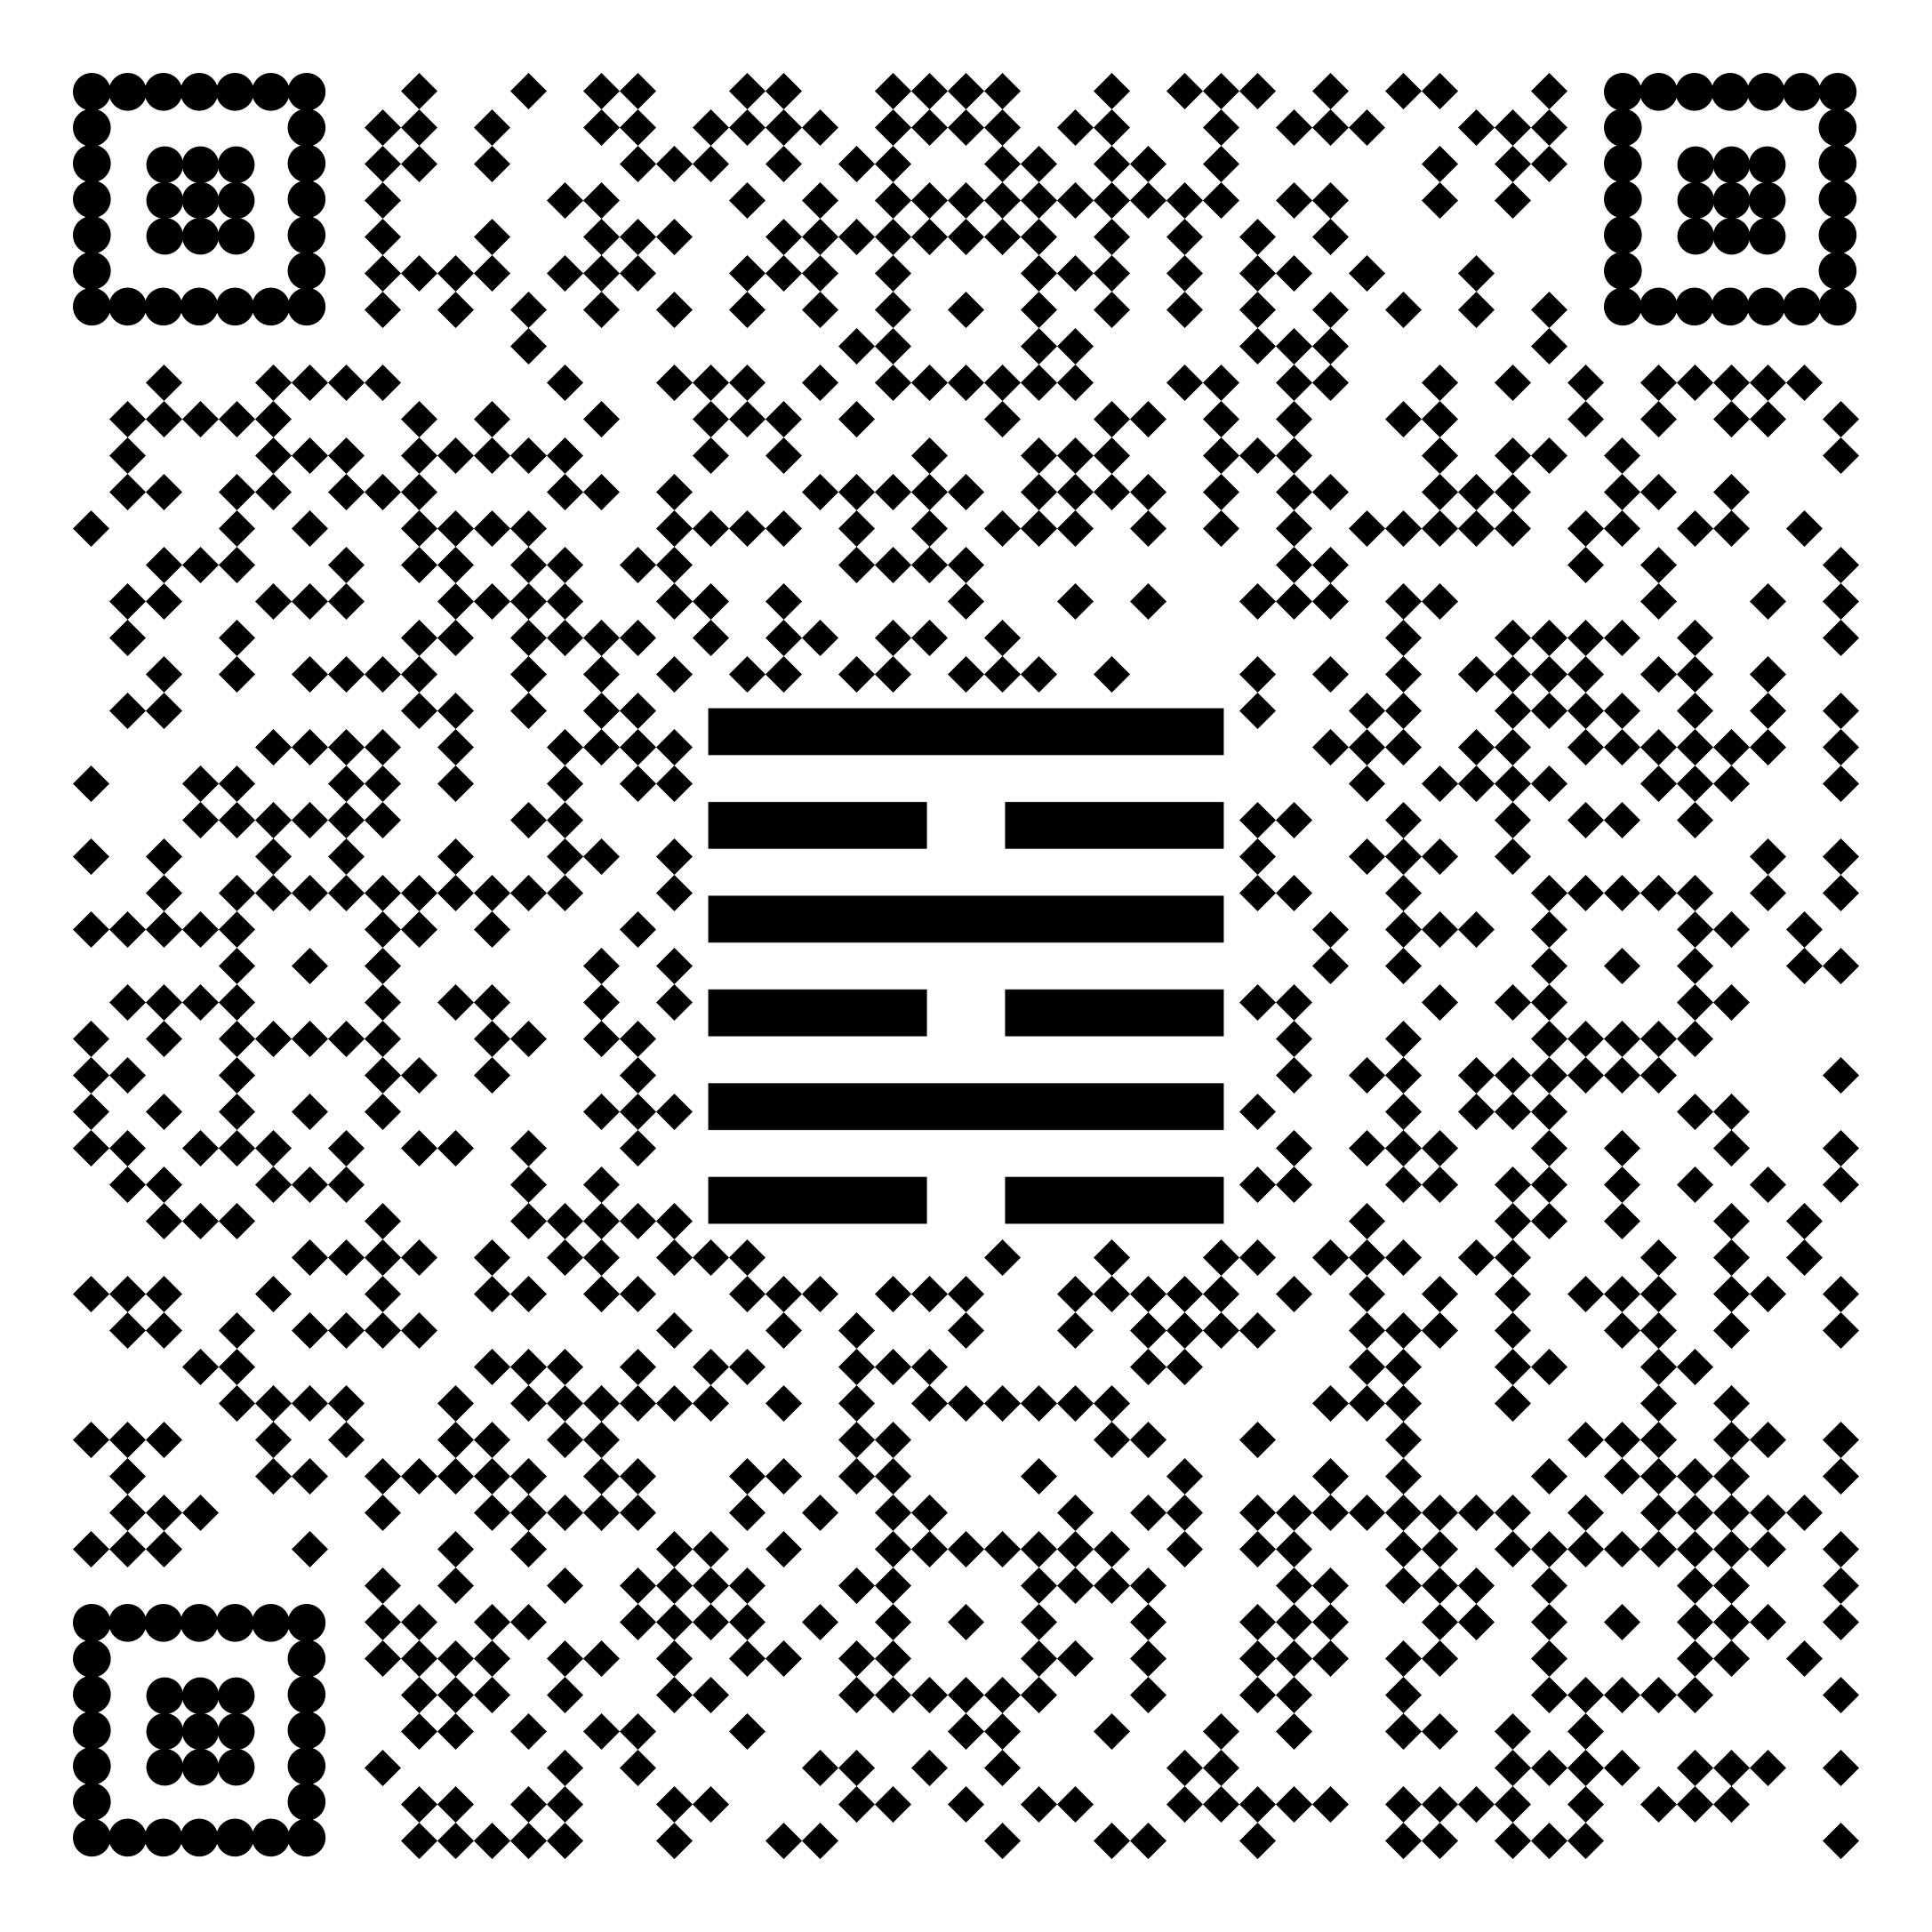 qr-code-64.png